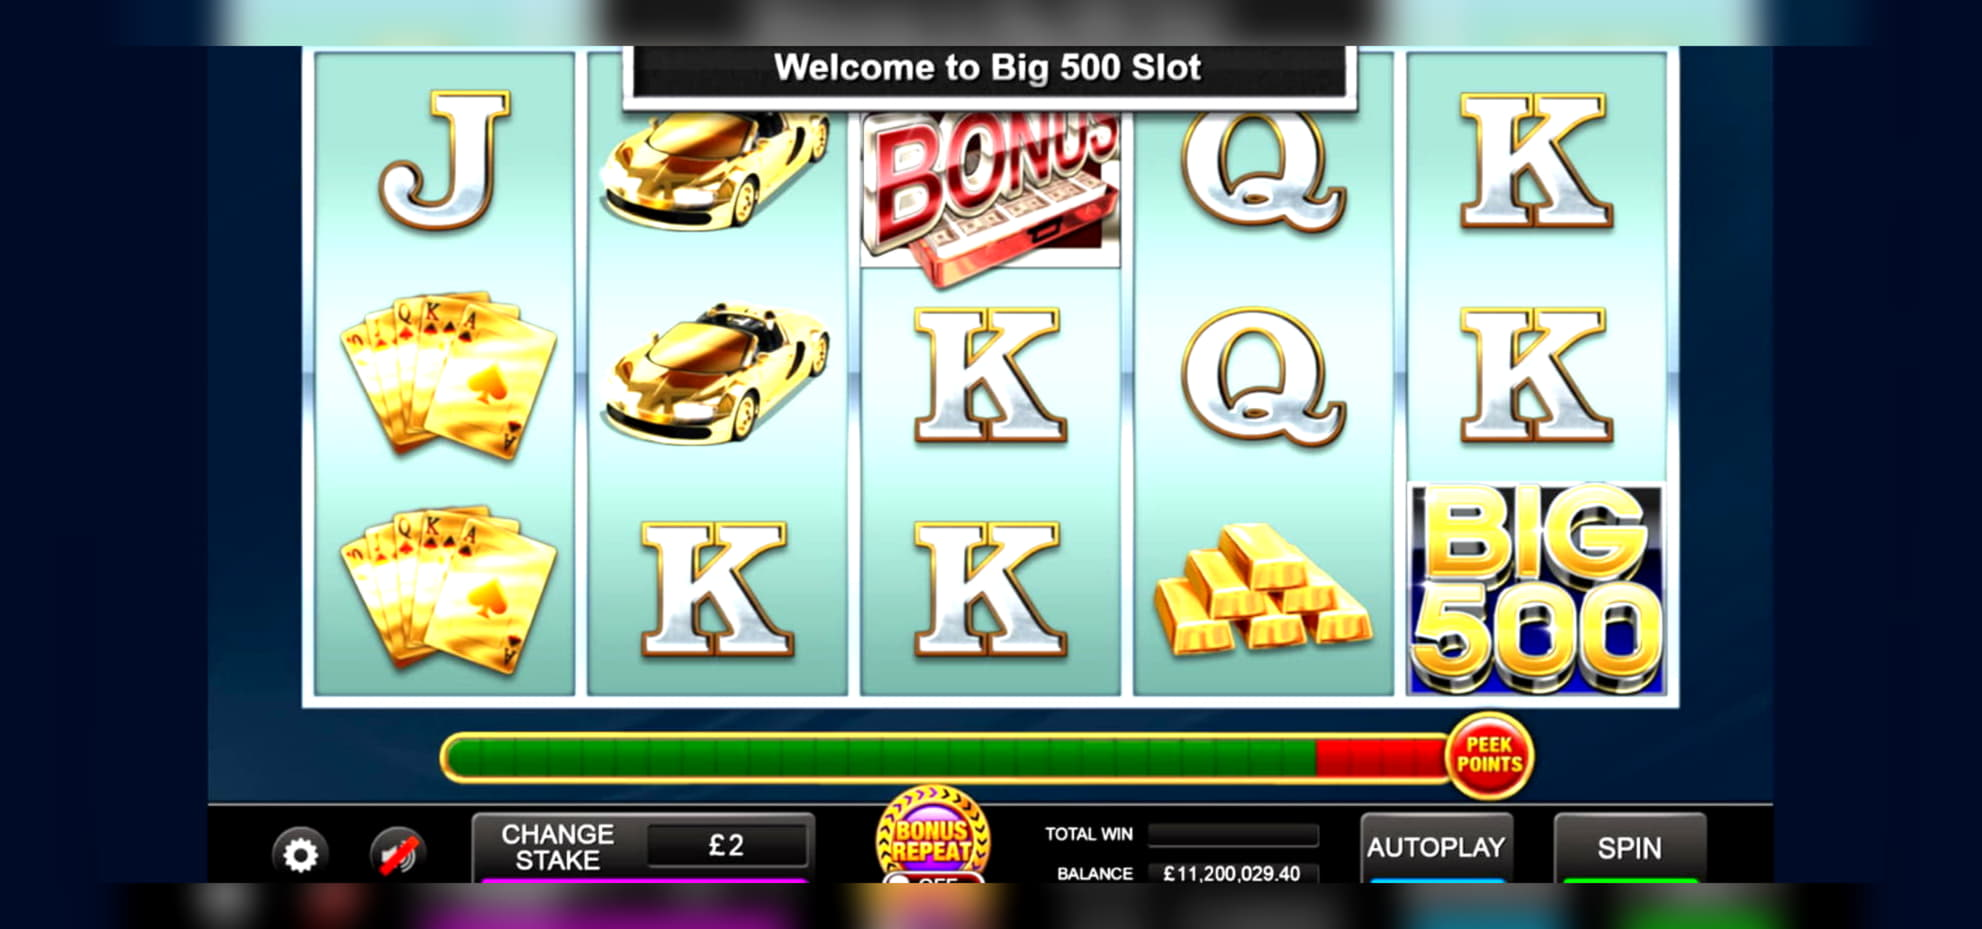 920% Welcome Bonus at LV Bet Casino